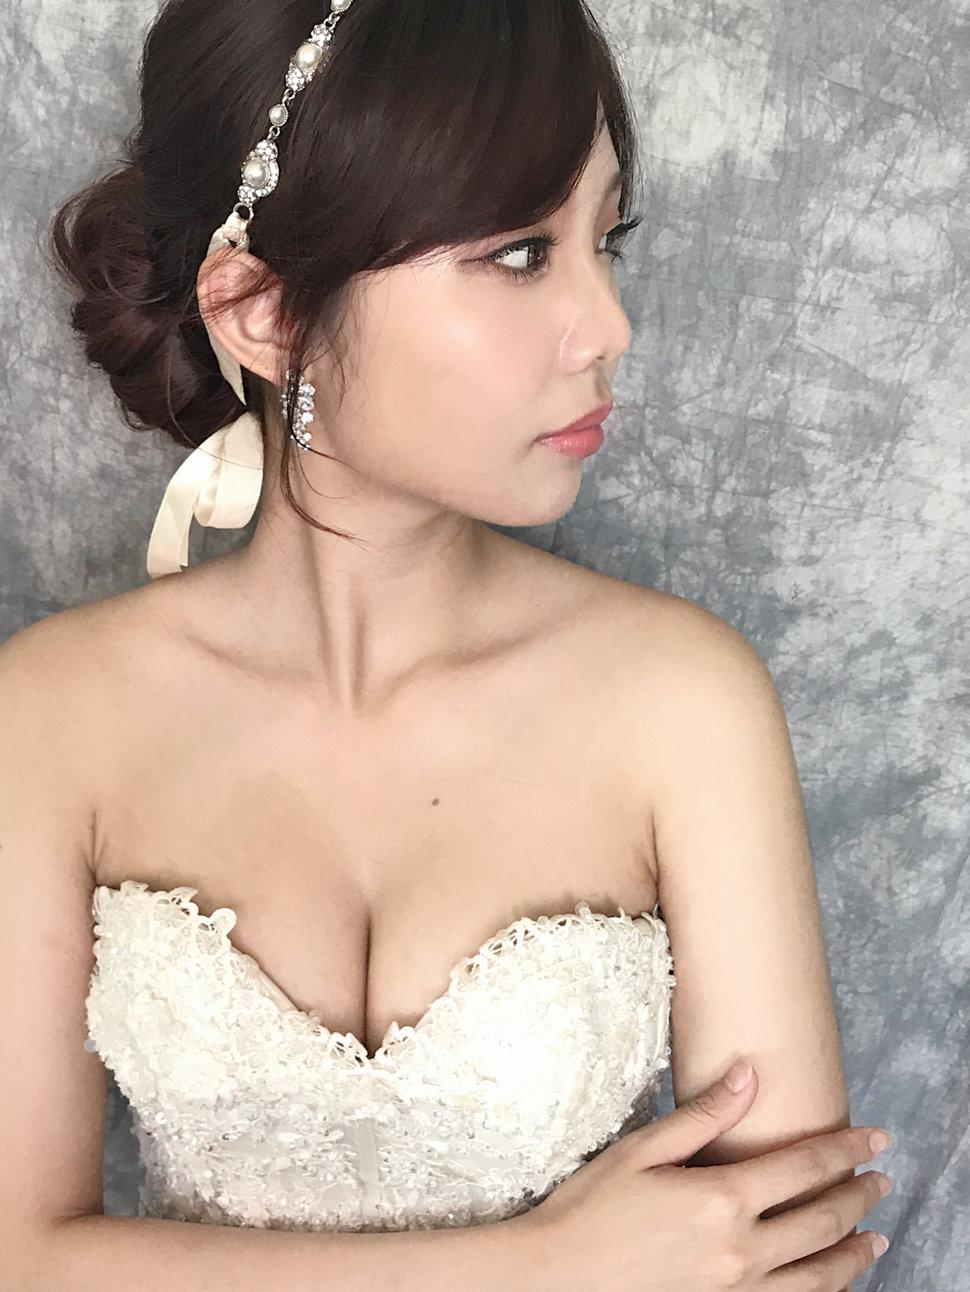 A57B69C8-6F5B-4B1A-9BCB-D6027089A9D4 - 台中高雄新娘秘書Ally Chen《結婚吧》